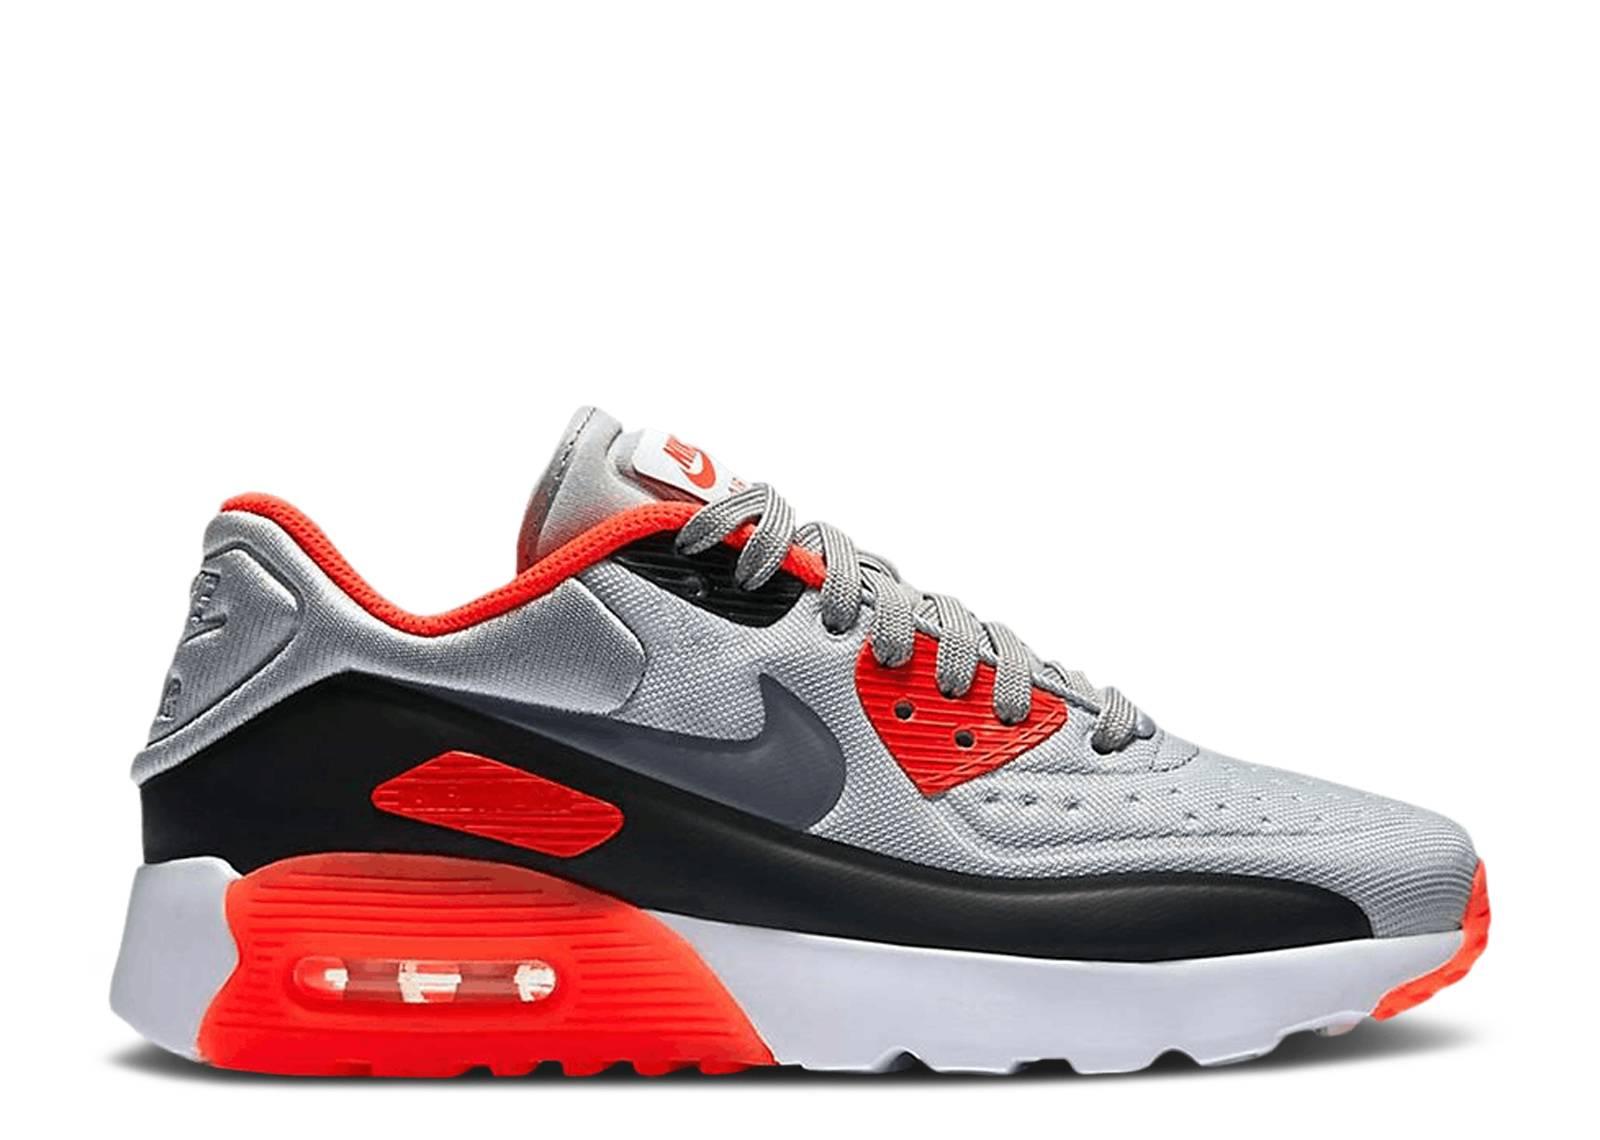 Restringir Derivación Recientemente  Air Max 90 Ultra SE GS 'Infrared' - Nike - 844599 004 - grey/black-red    Flight Club